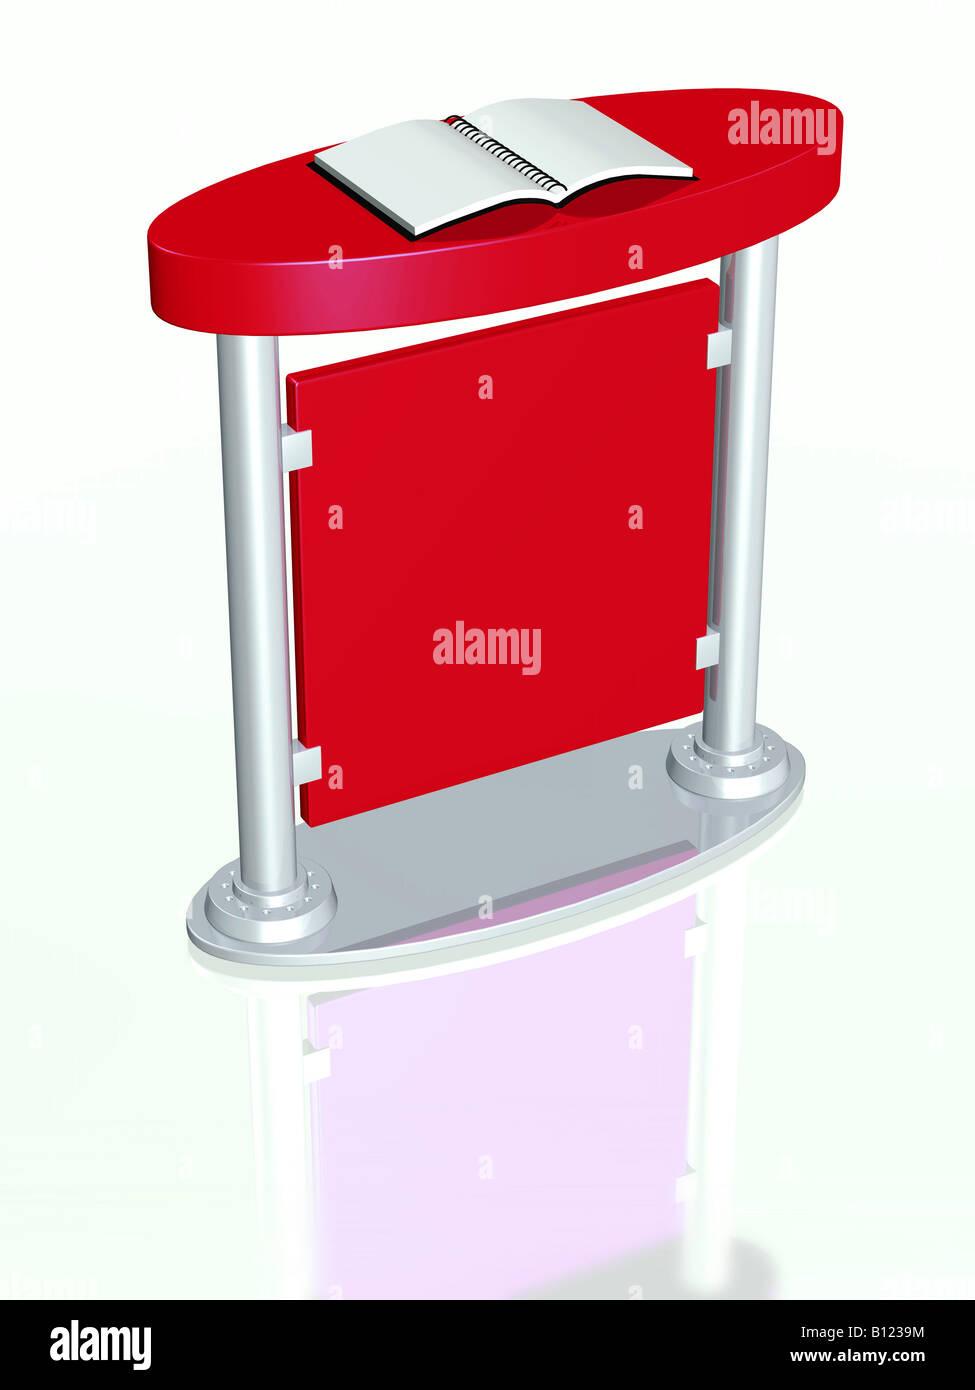 Presentation podium 3d concept illustration - Stock Image